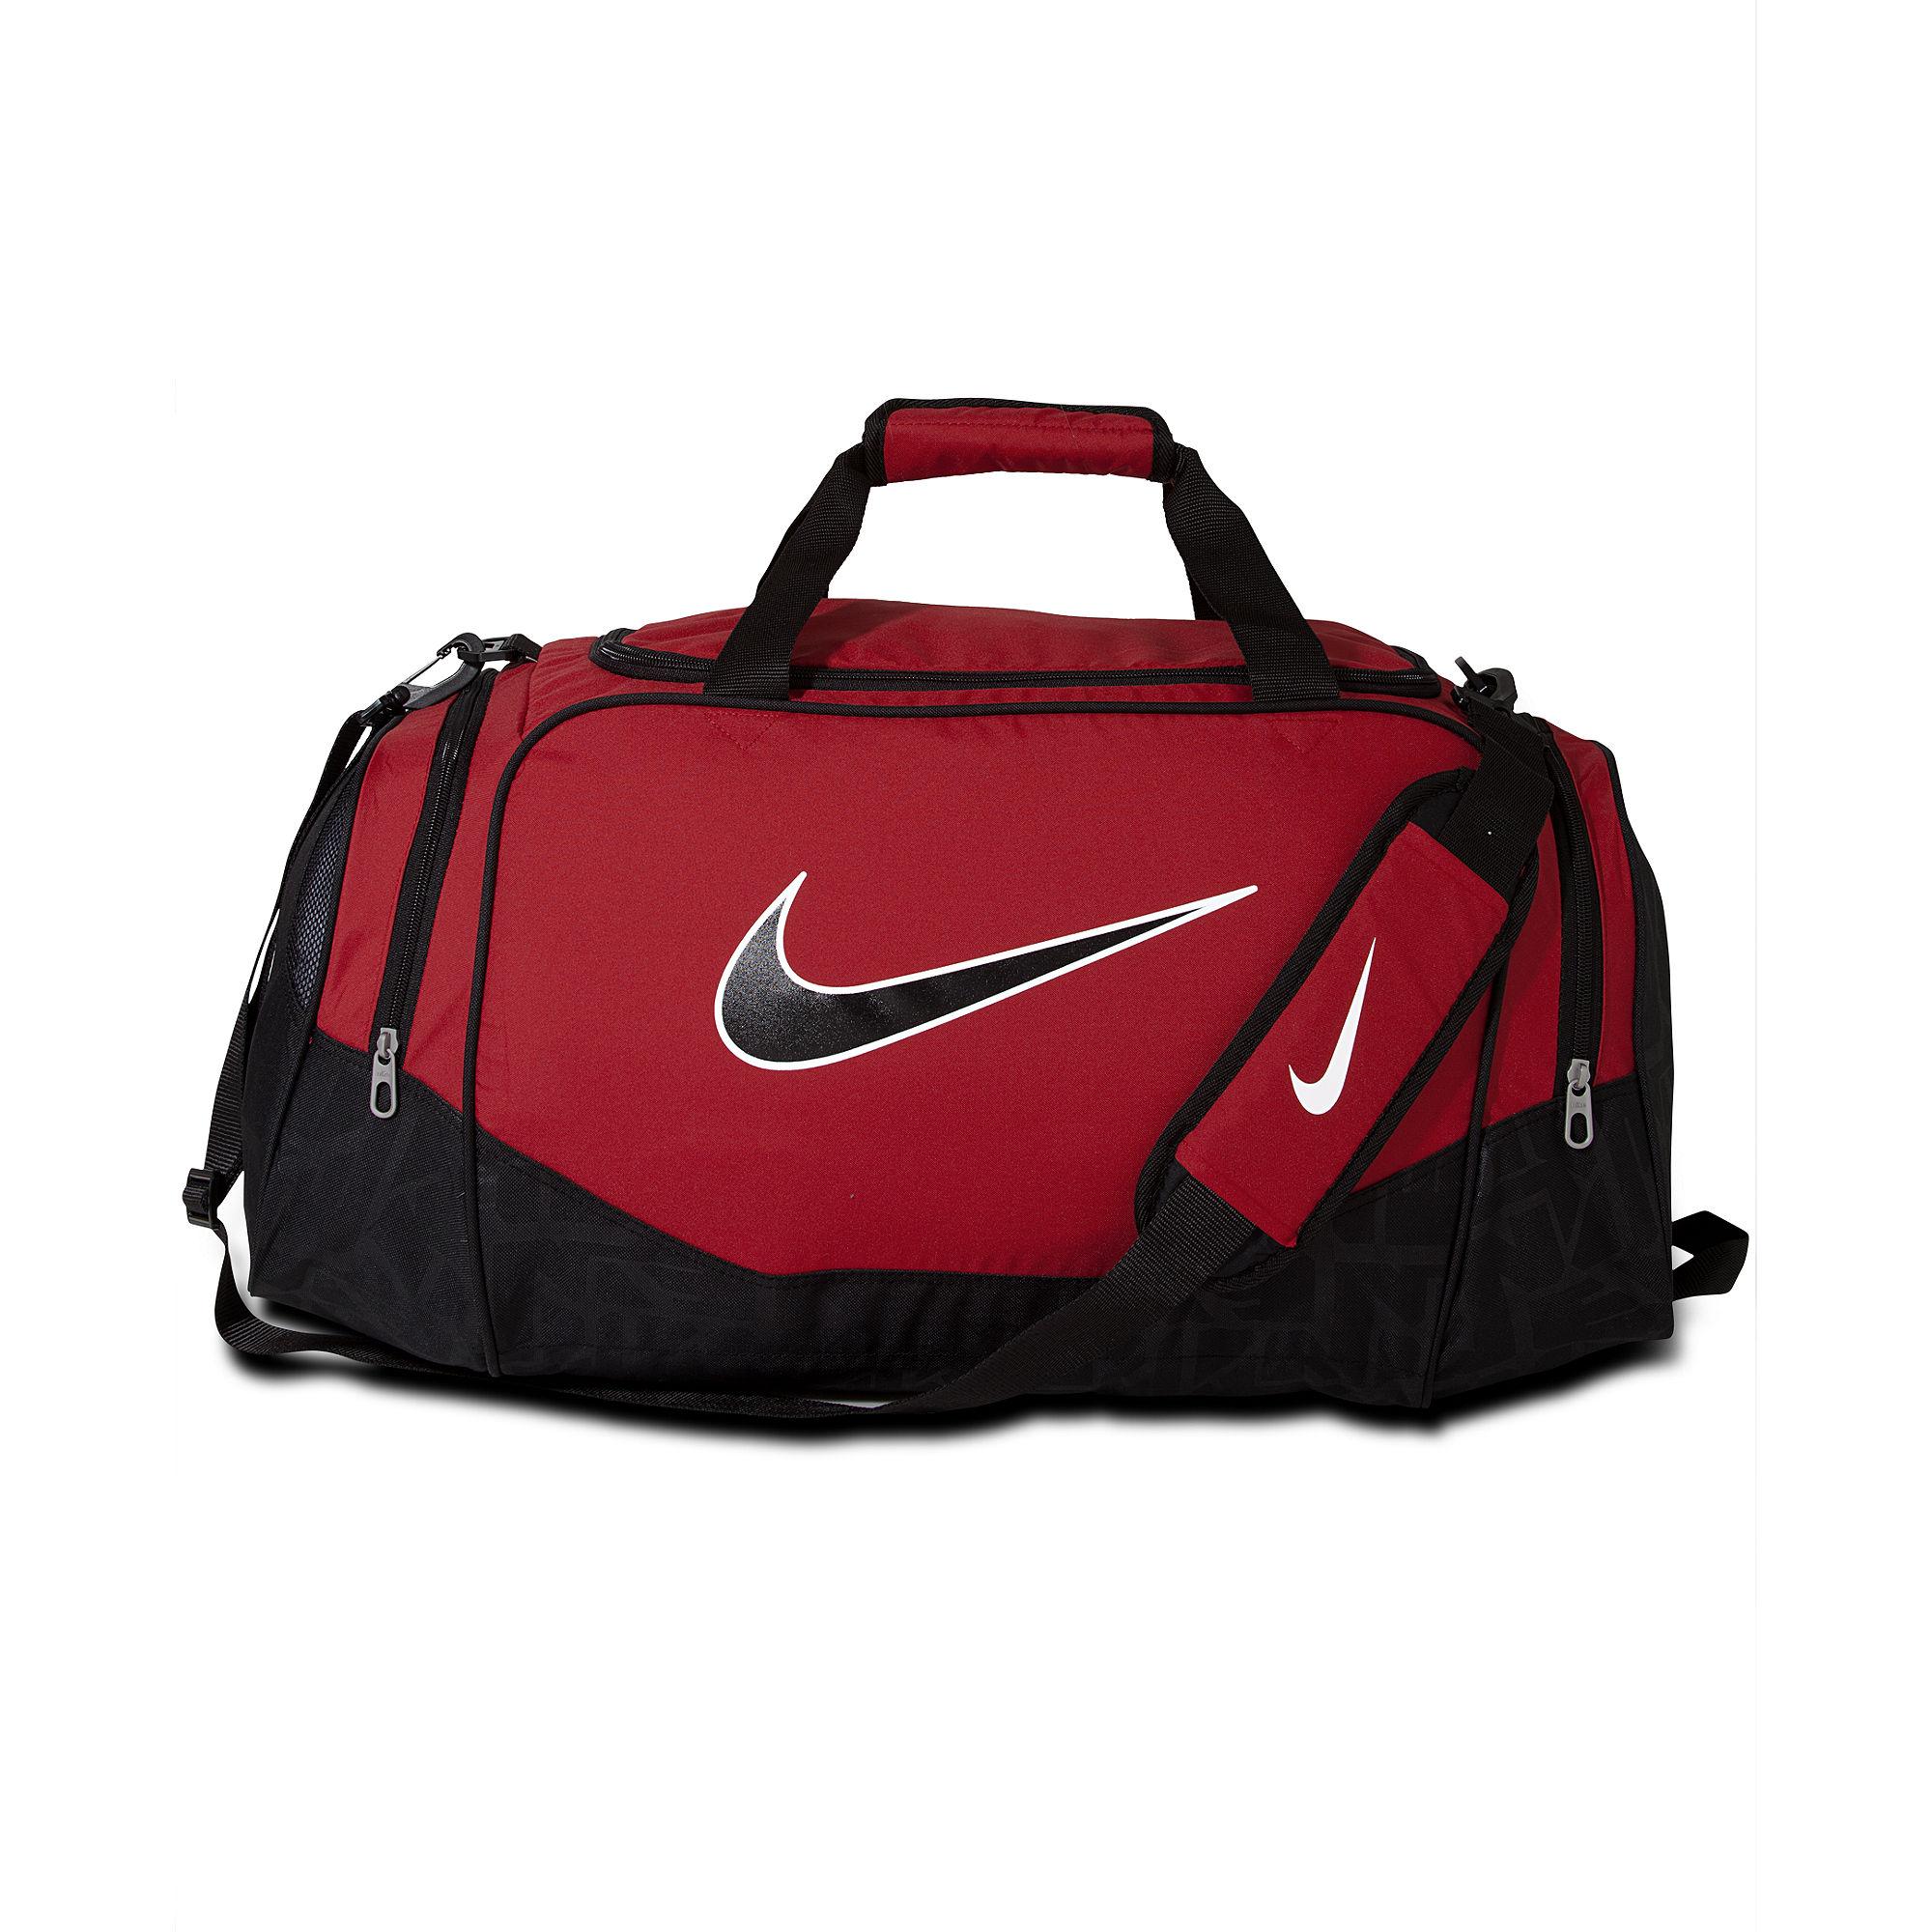 Nike Brasilia 6 Medium Duffle Bag, Black at John Lewis ... |Nike Dry Bag